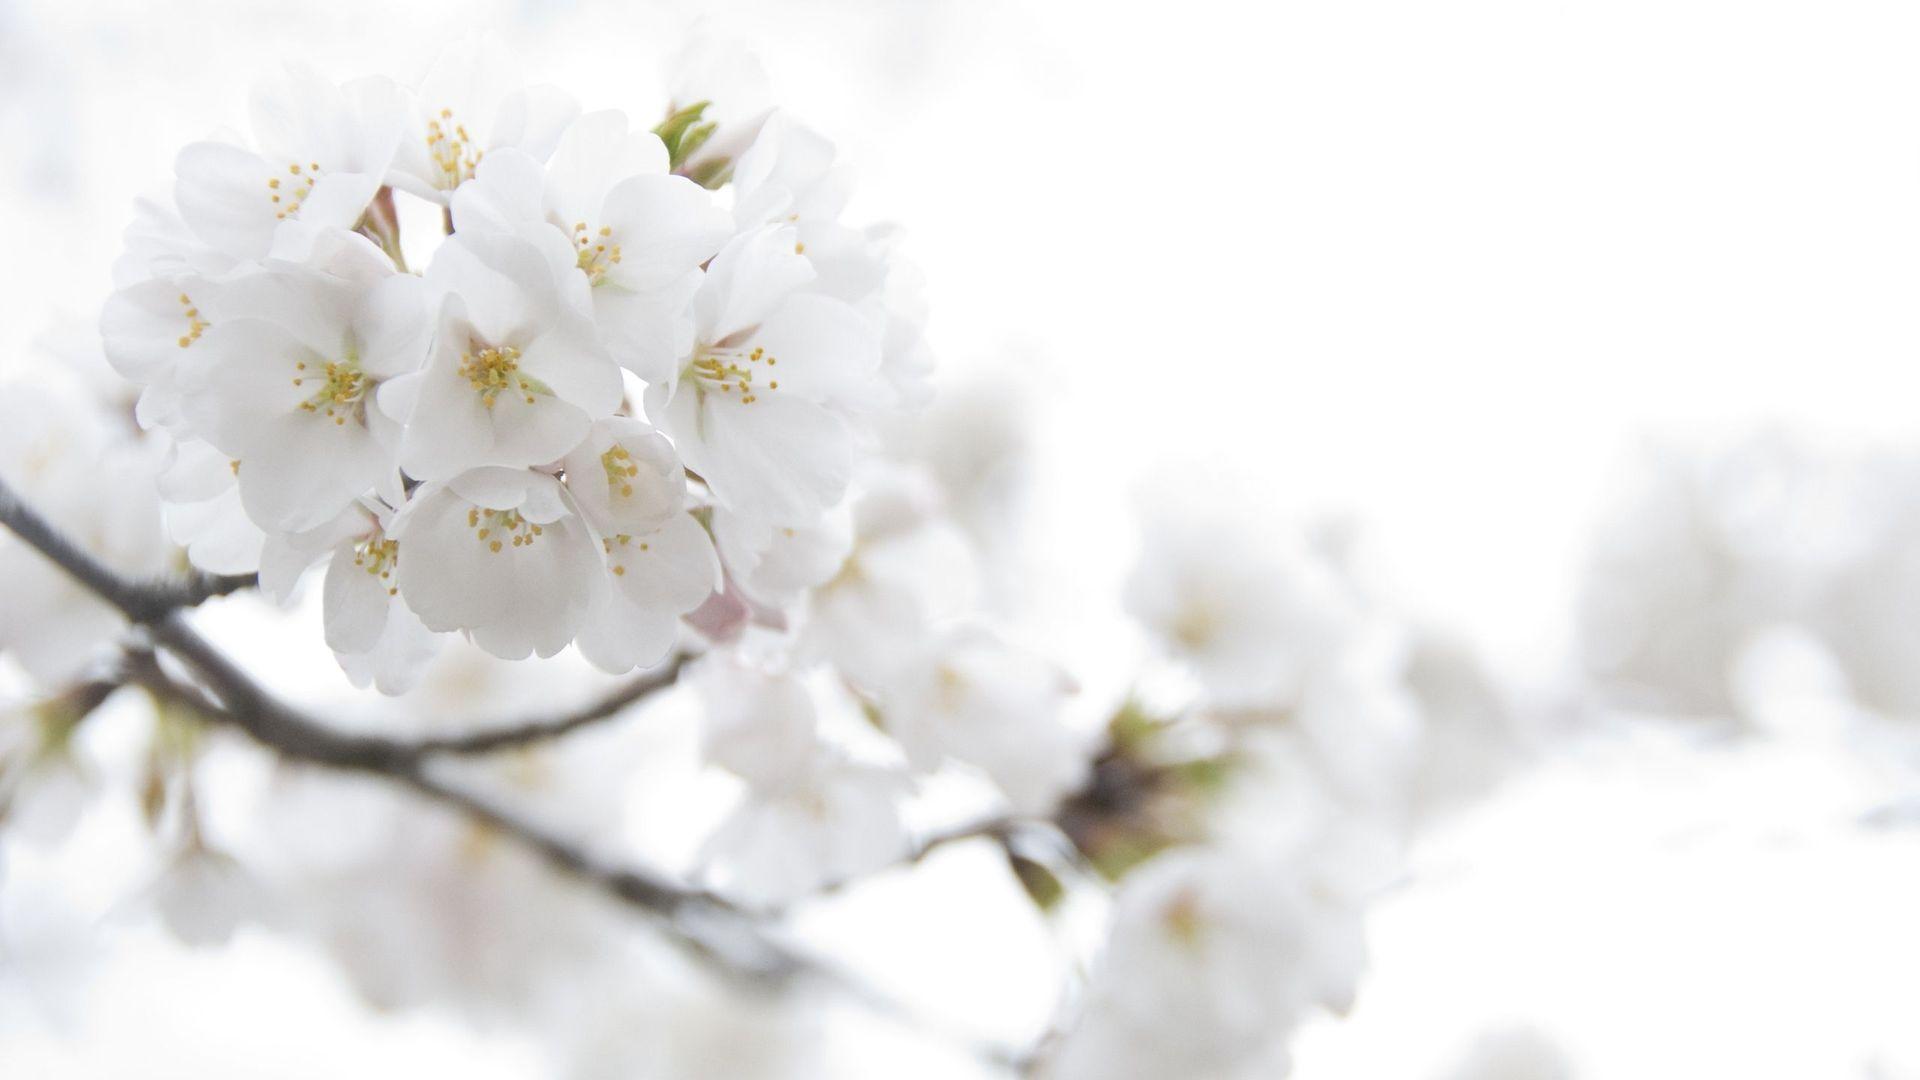 White Flower Hd Wallpaper Wallpapers